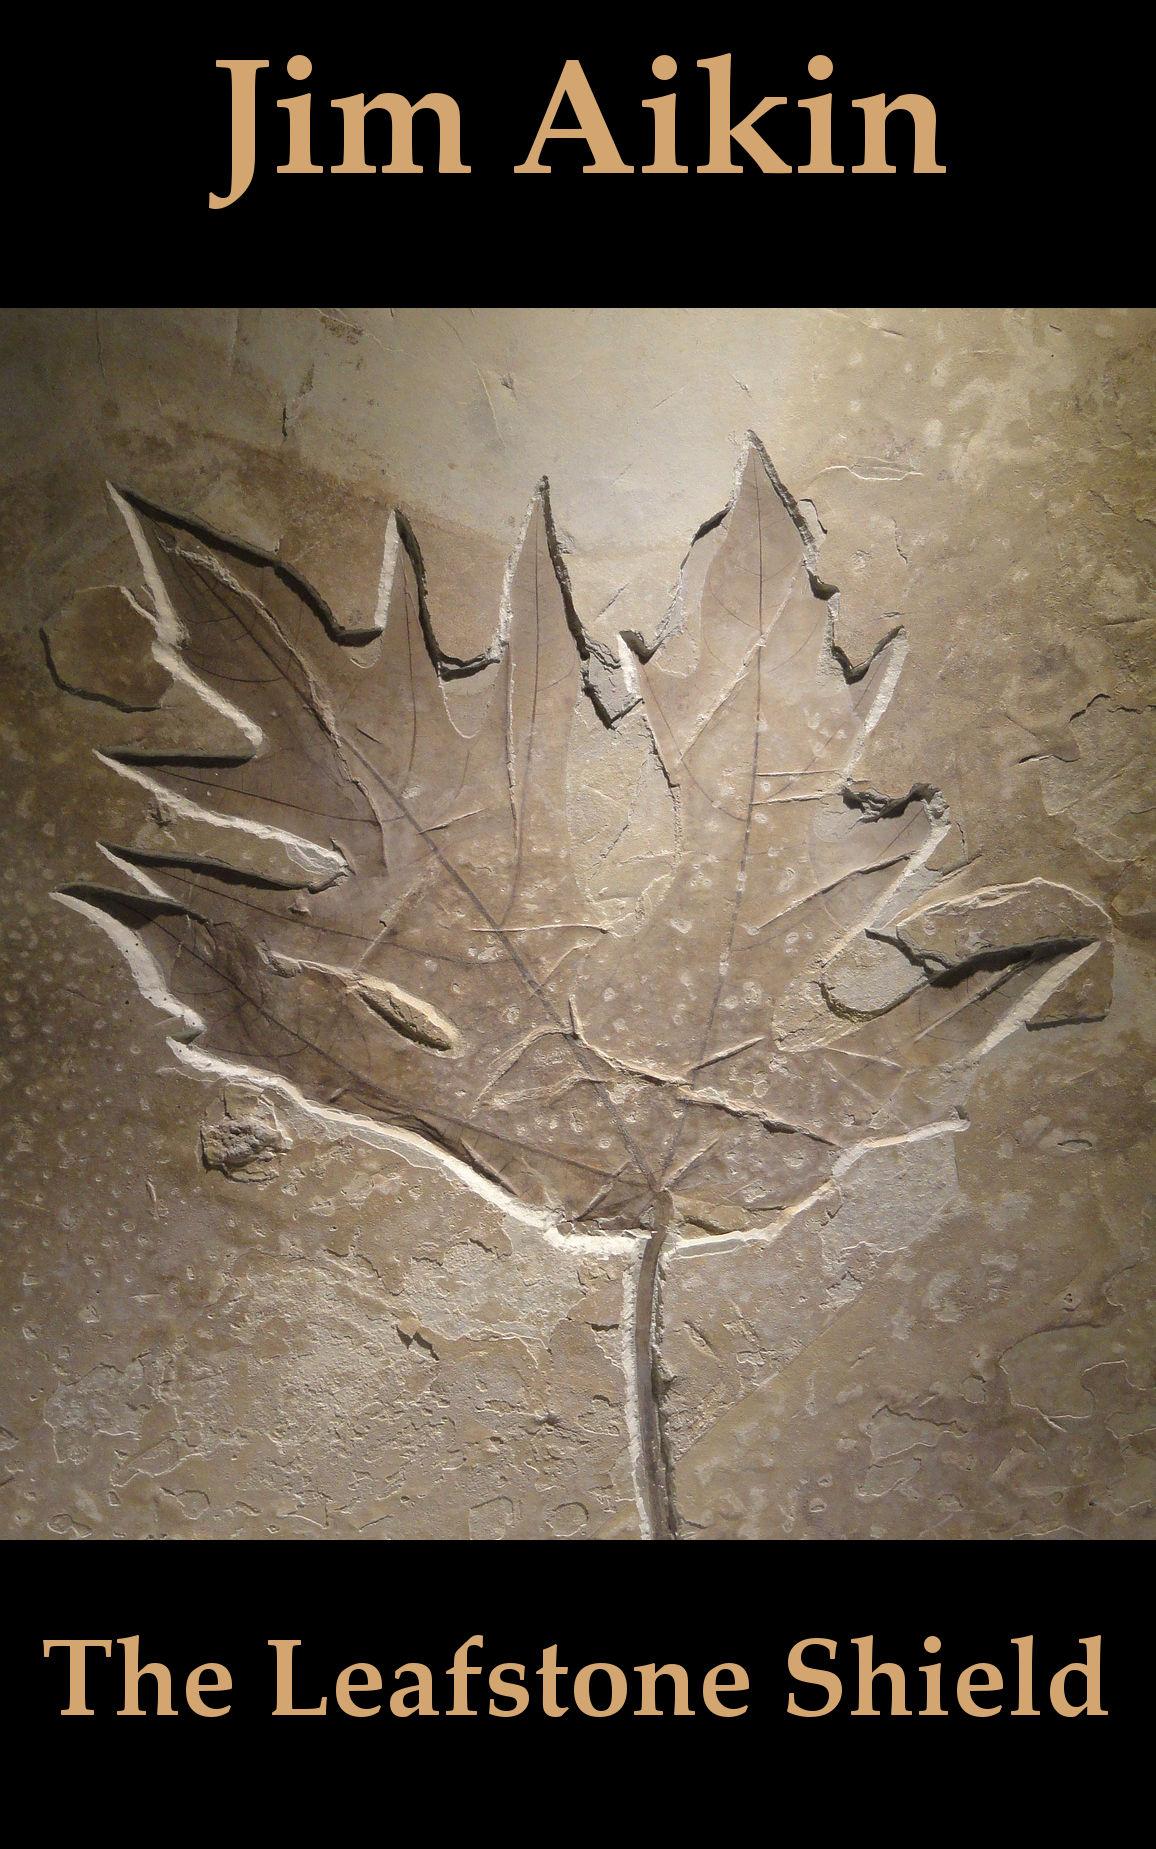 The Leafstone Shield